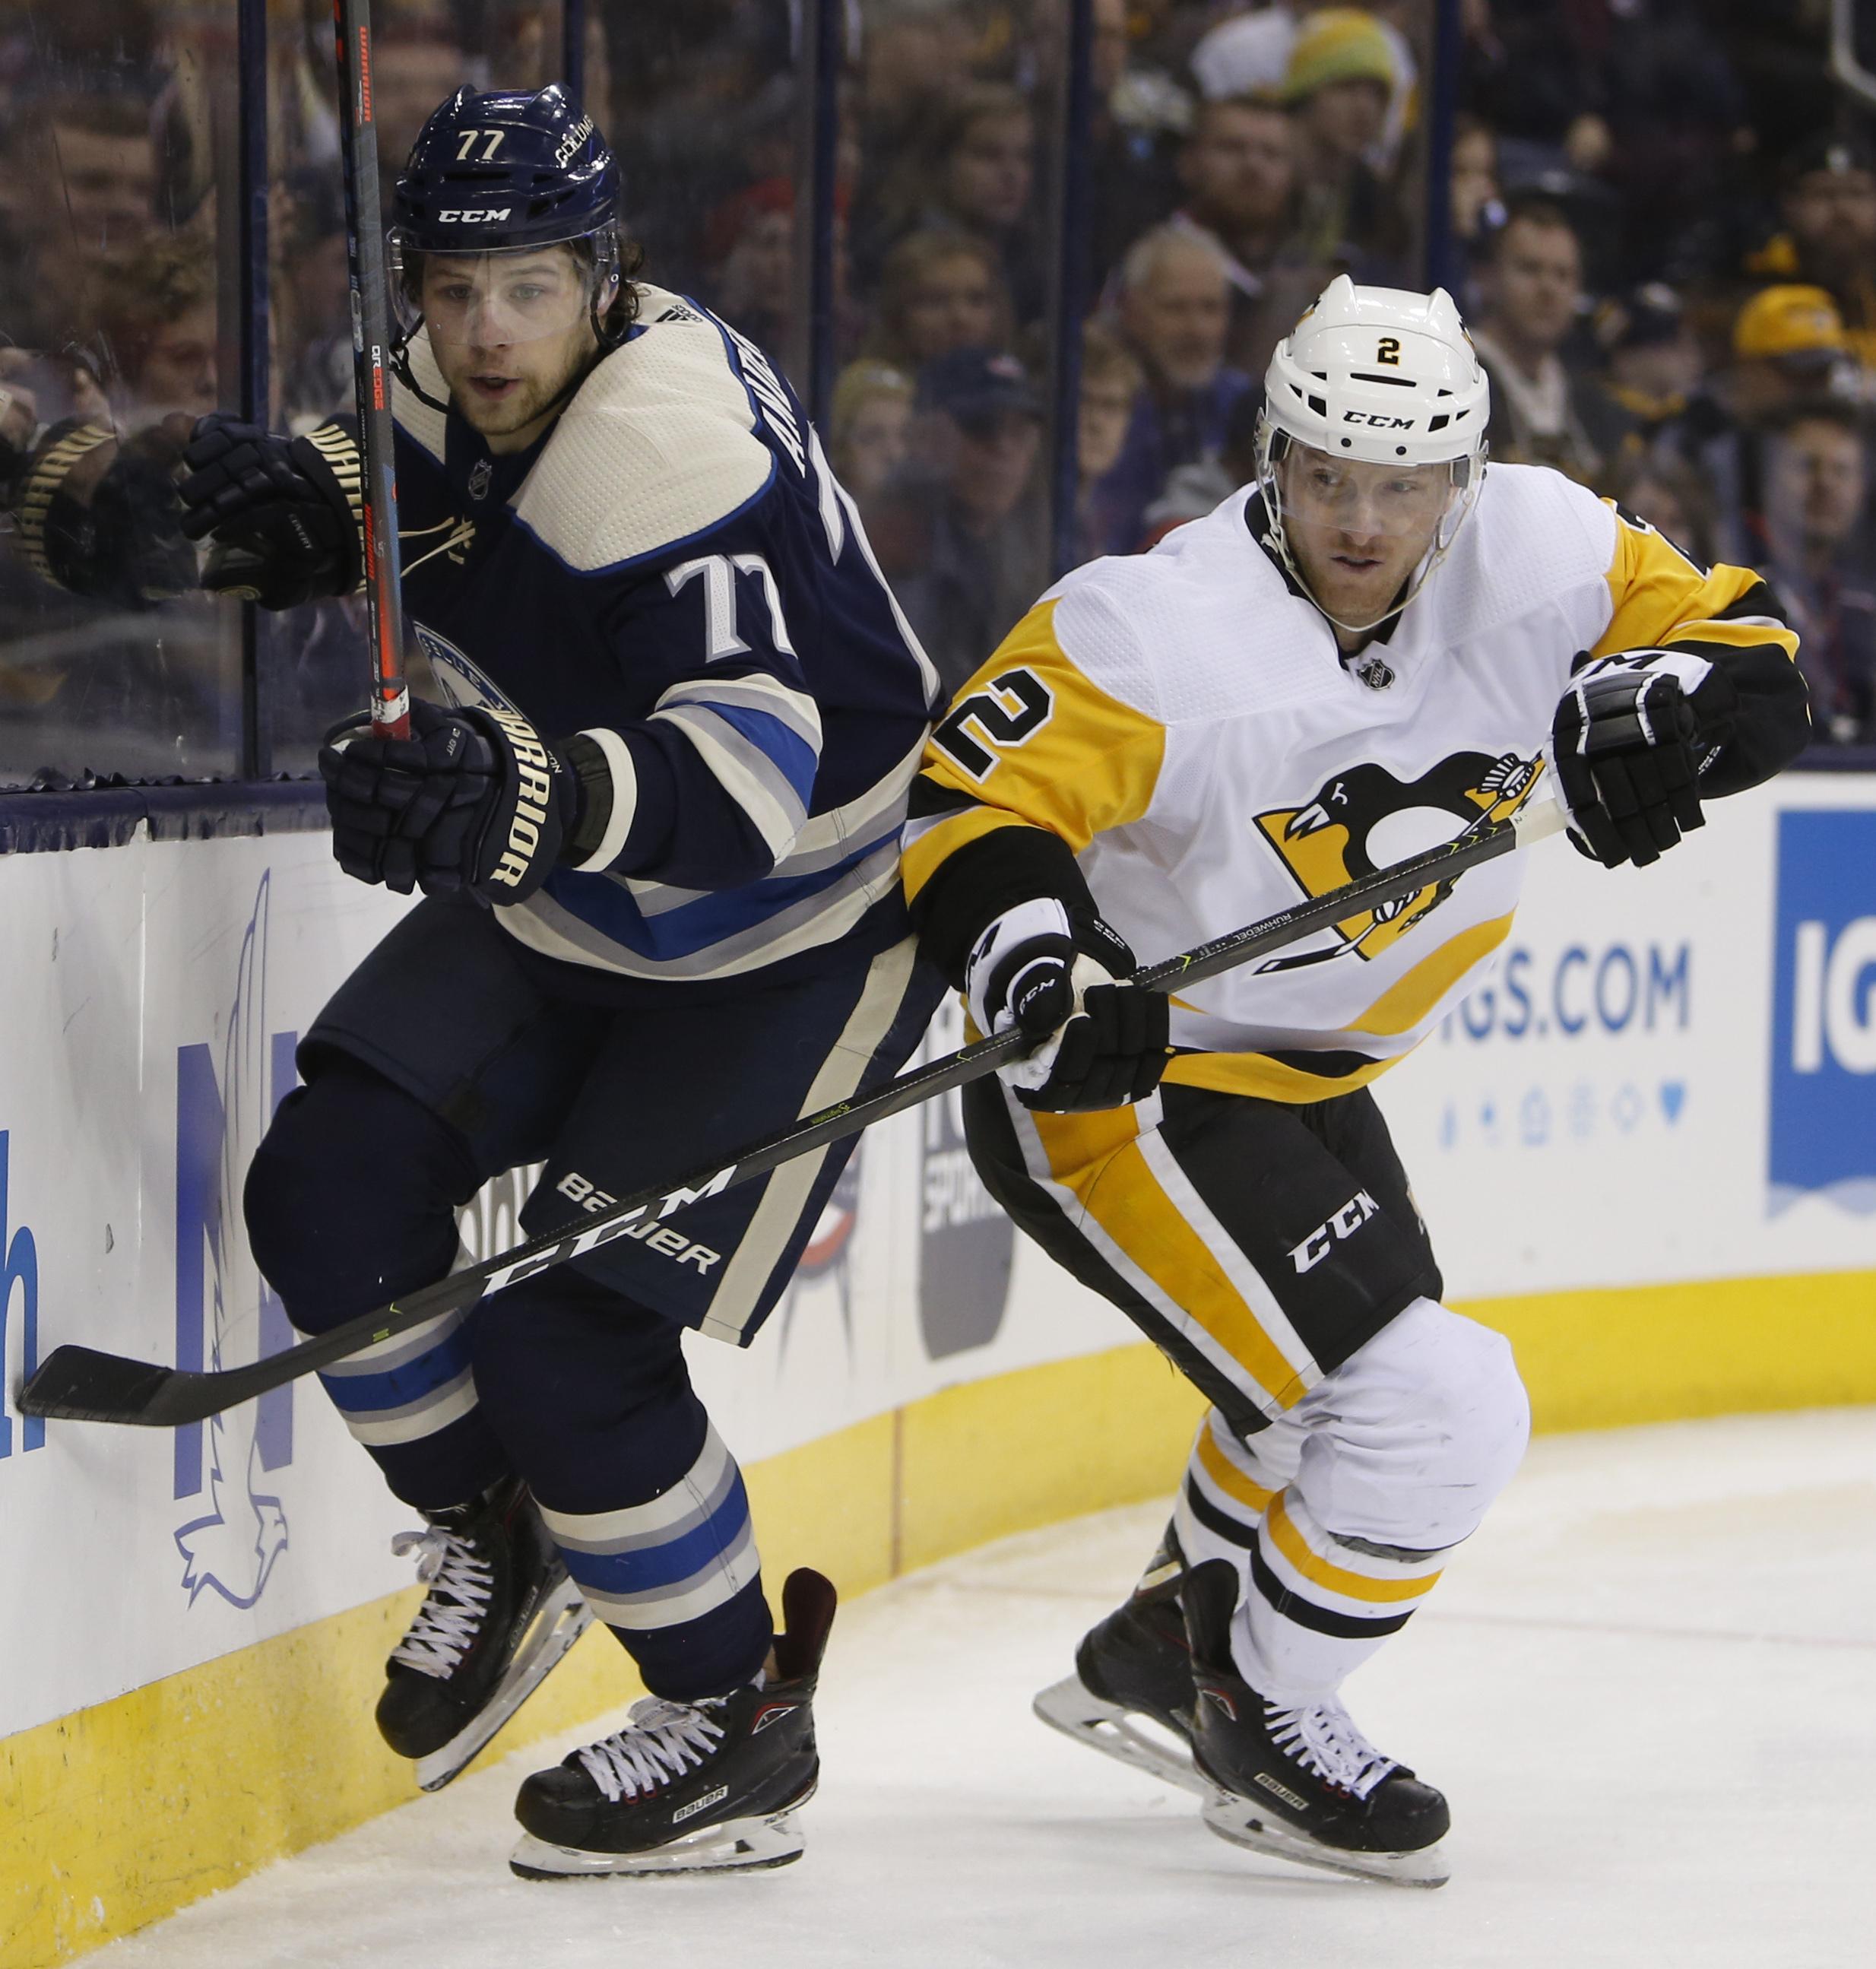 Penguins forward Rust, defenseman Ruhwedel out 'longer term'